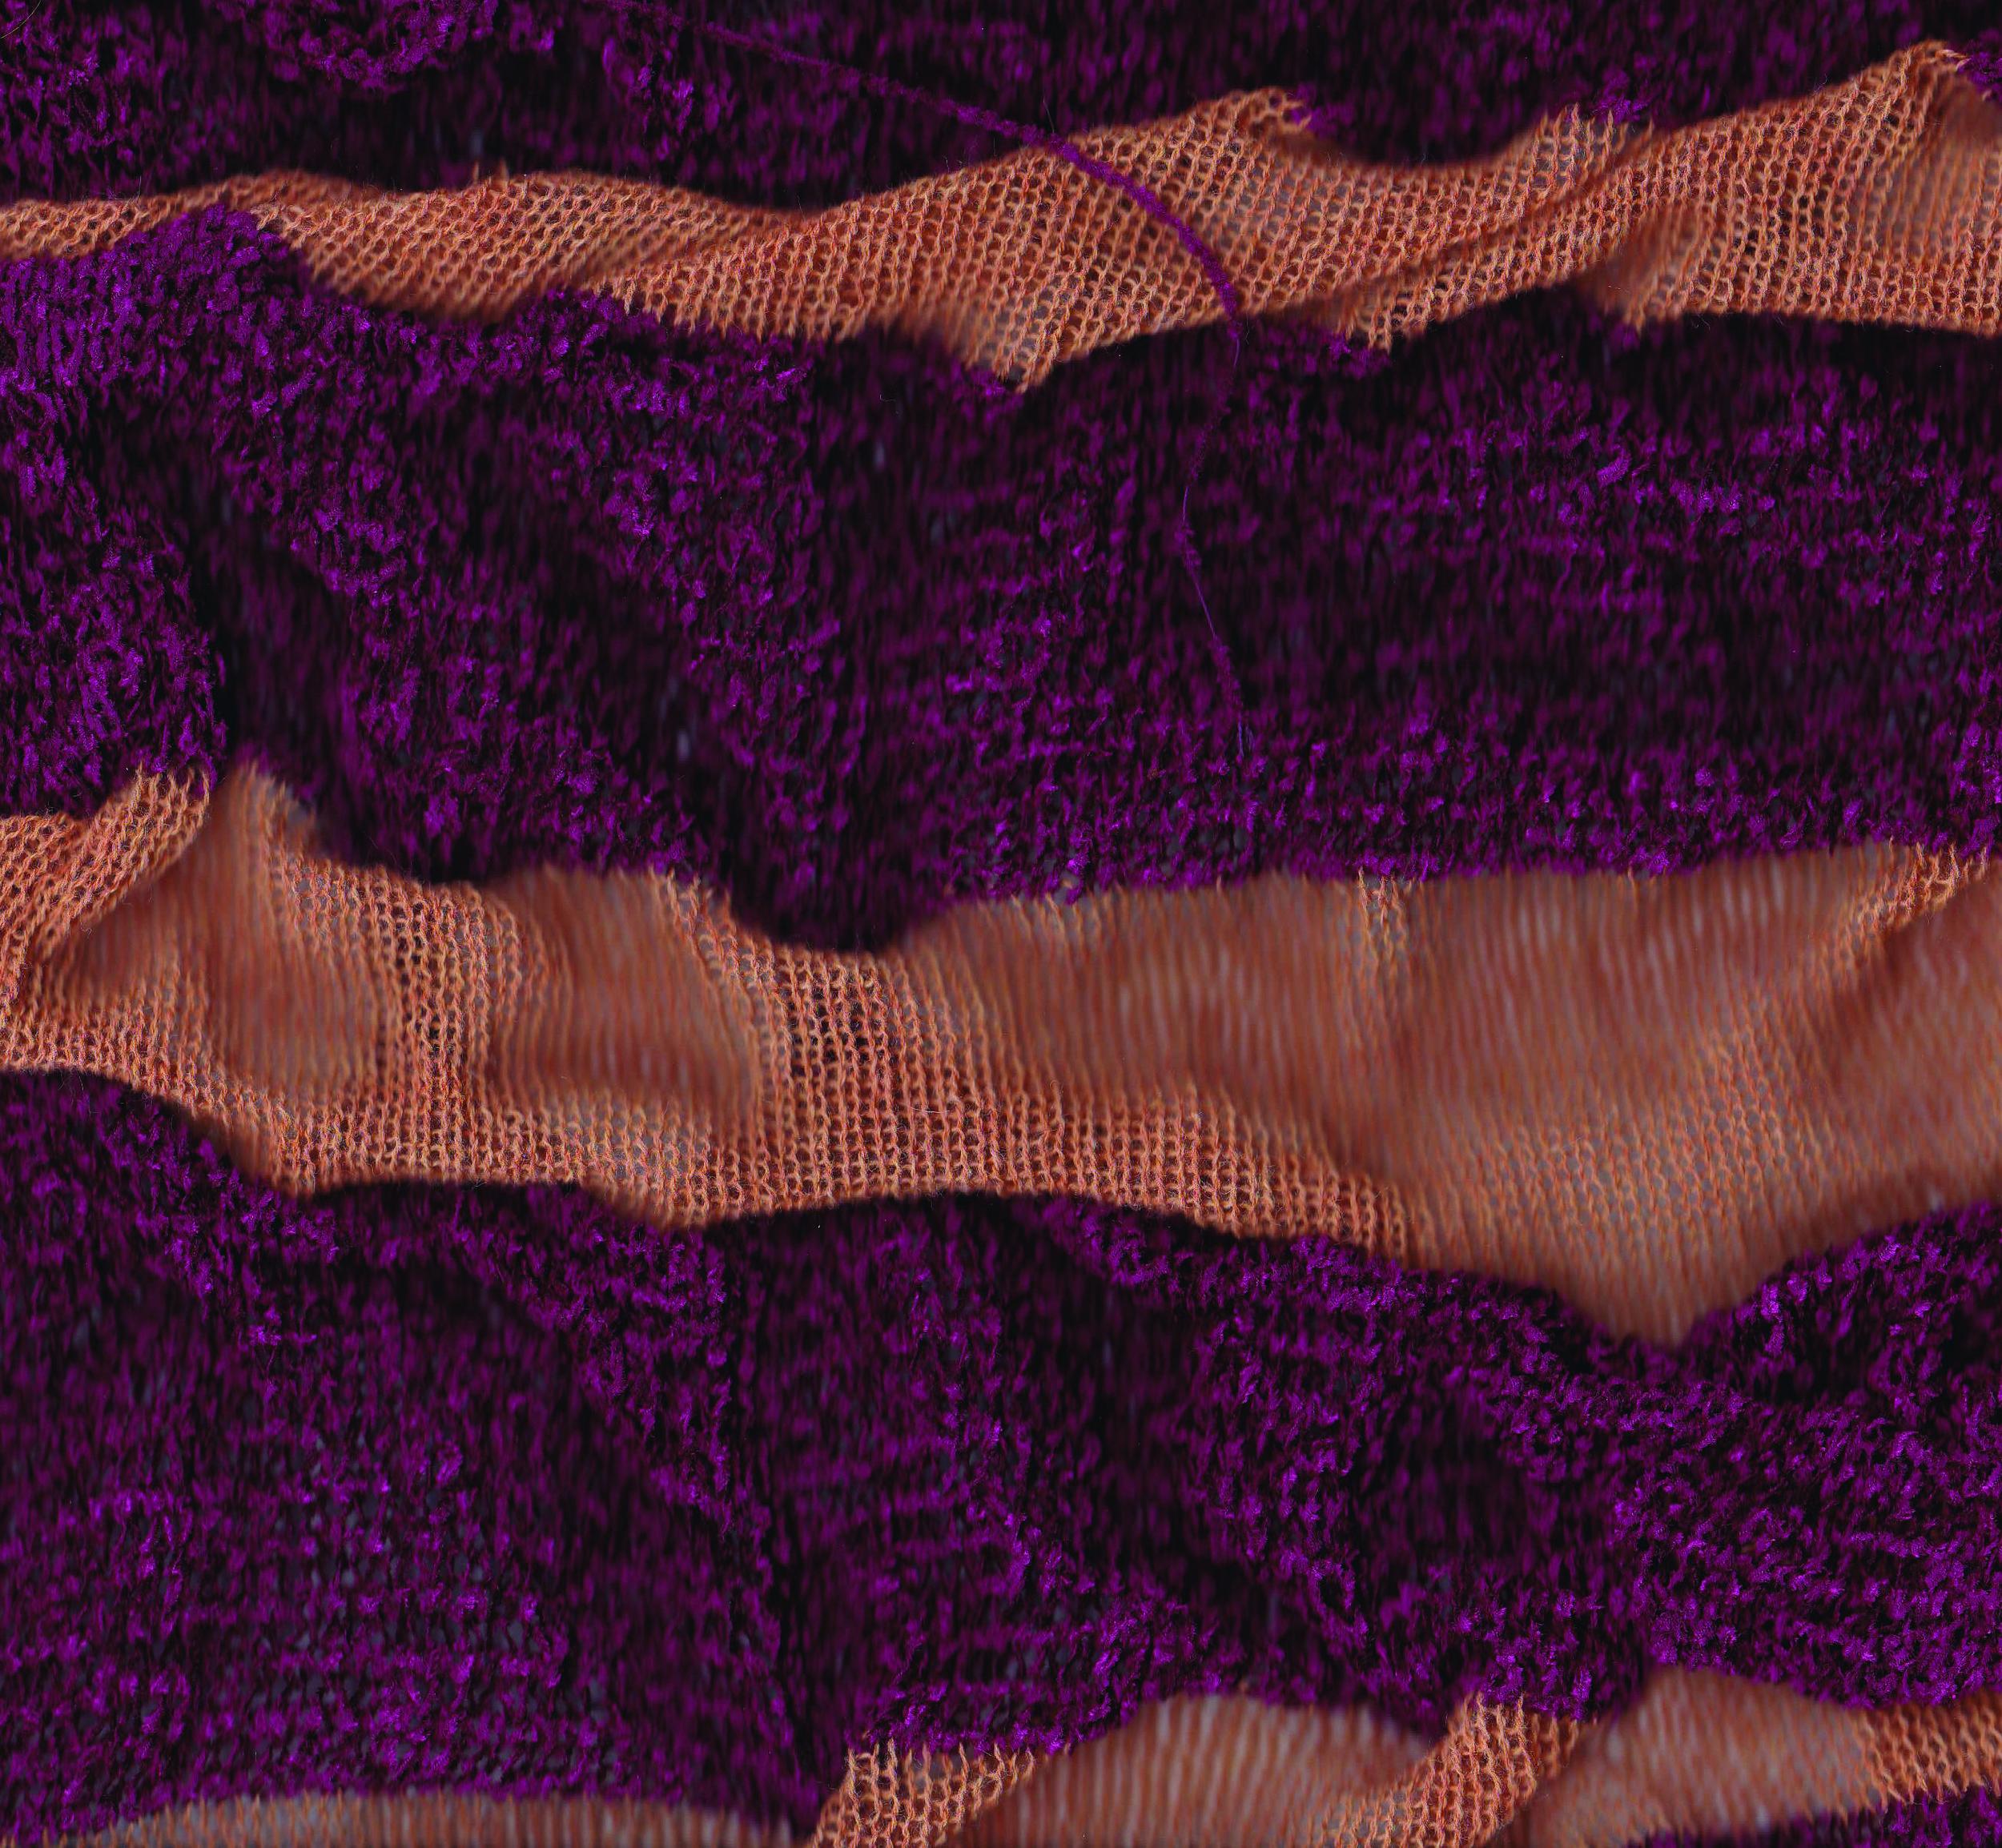 knitty_3.jpg